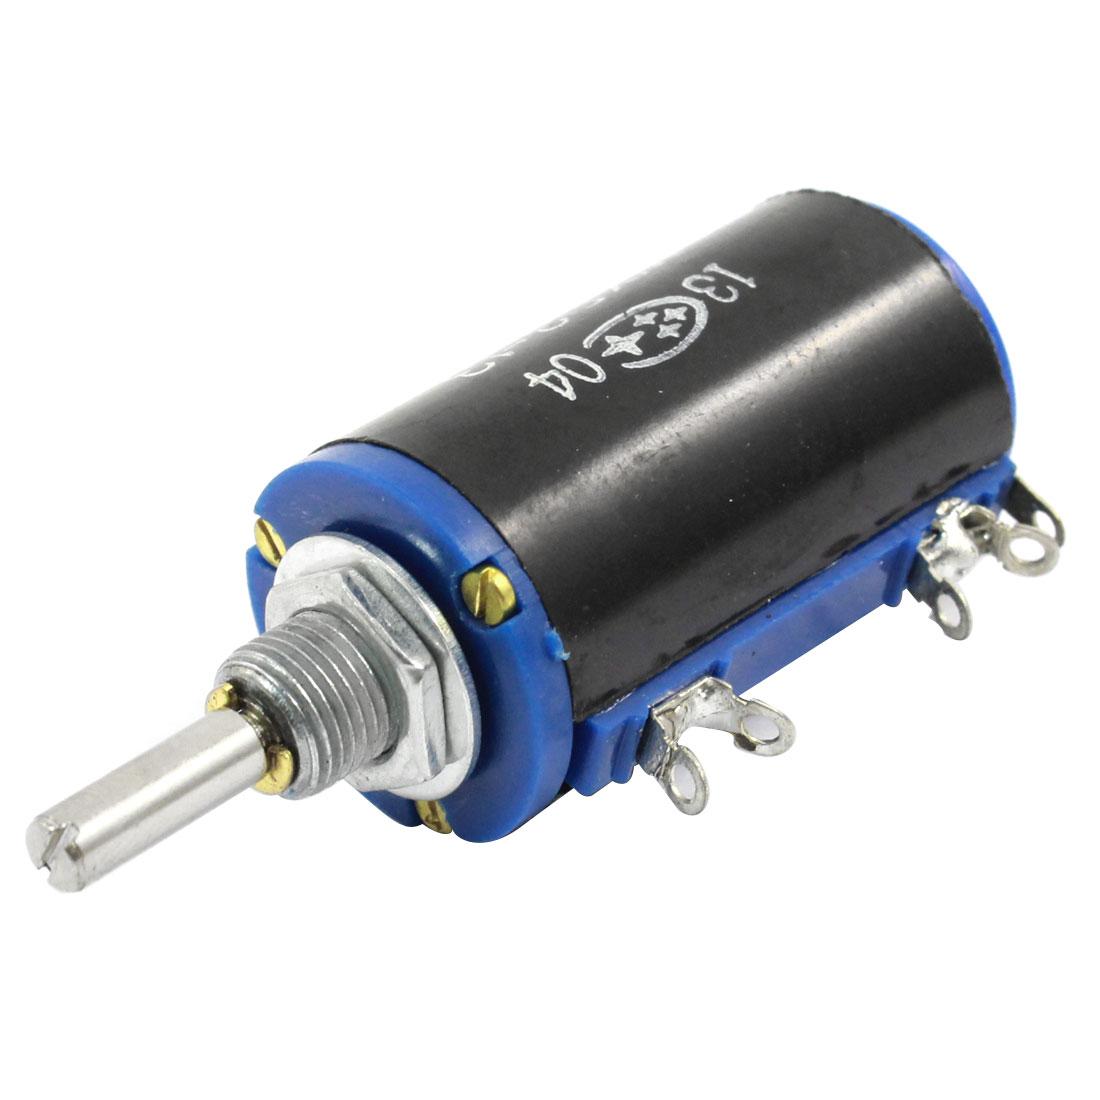 WXD3-13 2.2K Ohm 2W Rotary Wirewound Multiturn Taper Pot Potentiometer